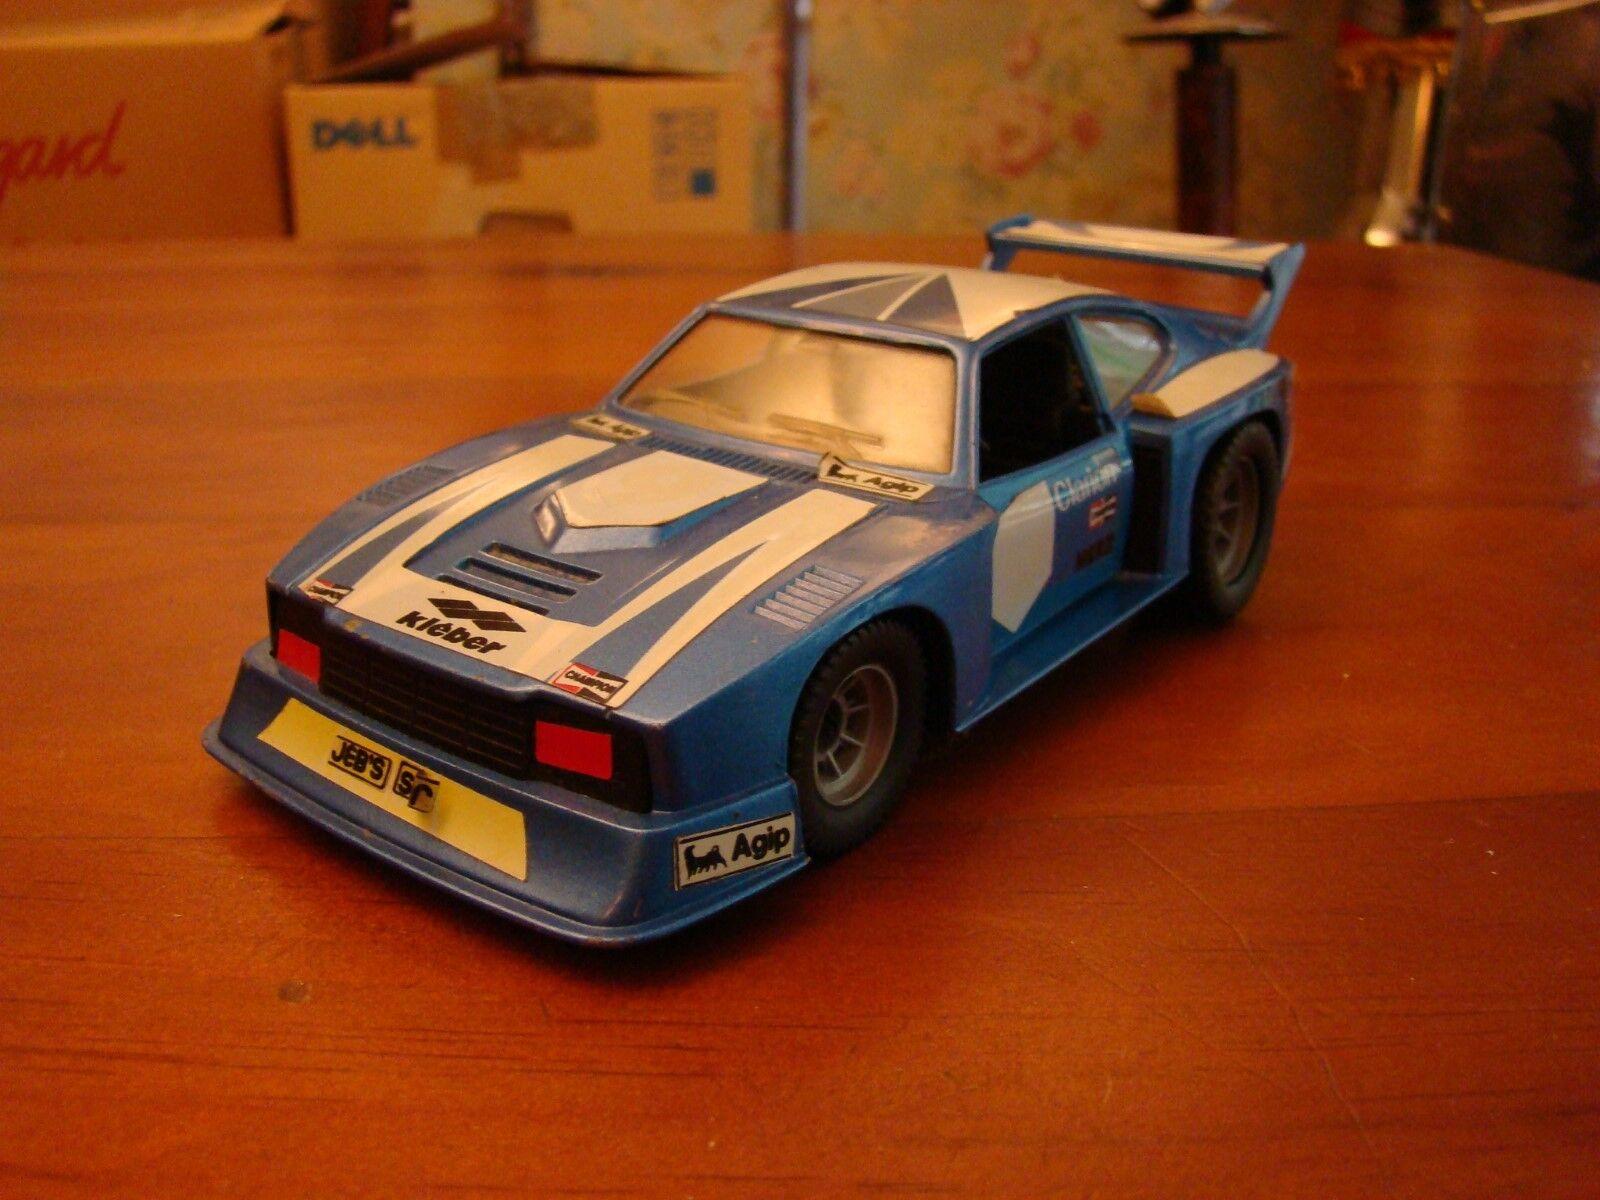 1 24 Ford Capri 2000 Model Touring Car Racer Car Rare